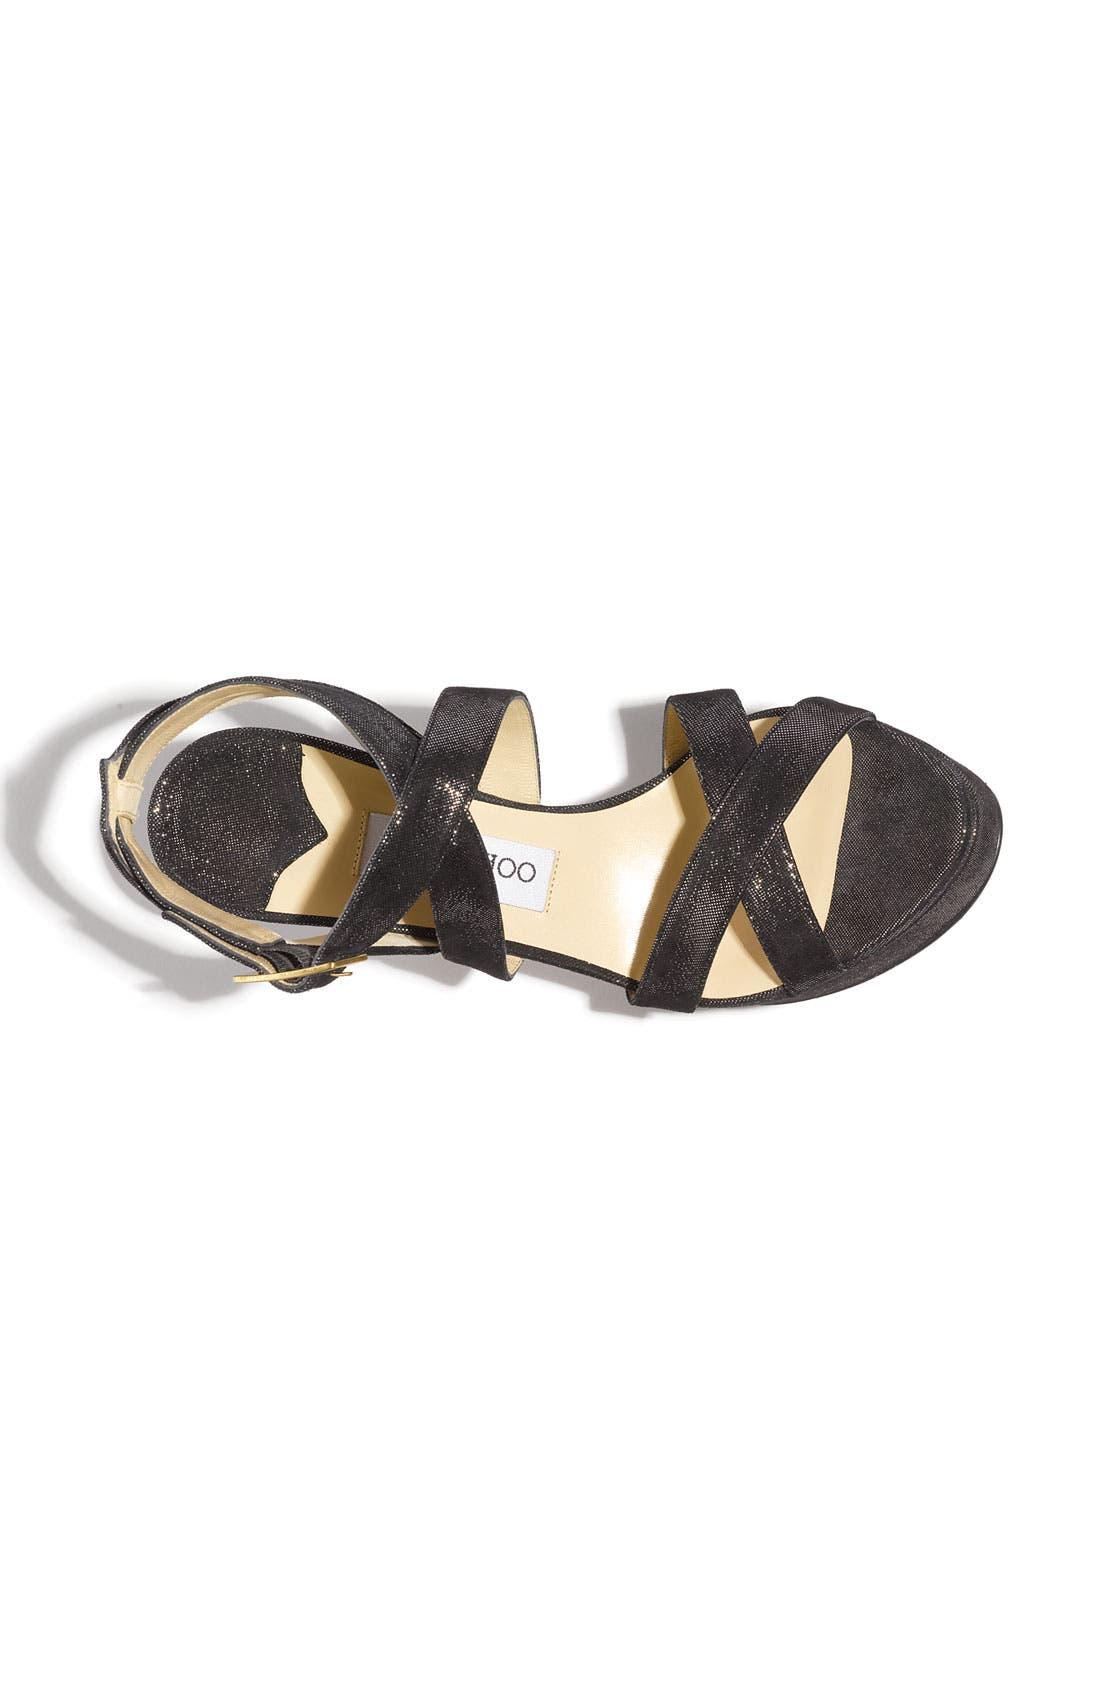 Alternate Image 3  - Jimmy Choo 'Vamp' Glitter Suede Sandal